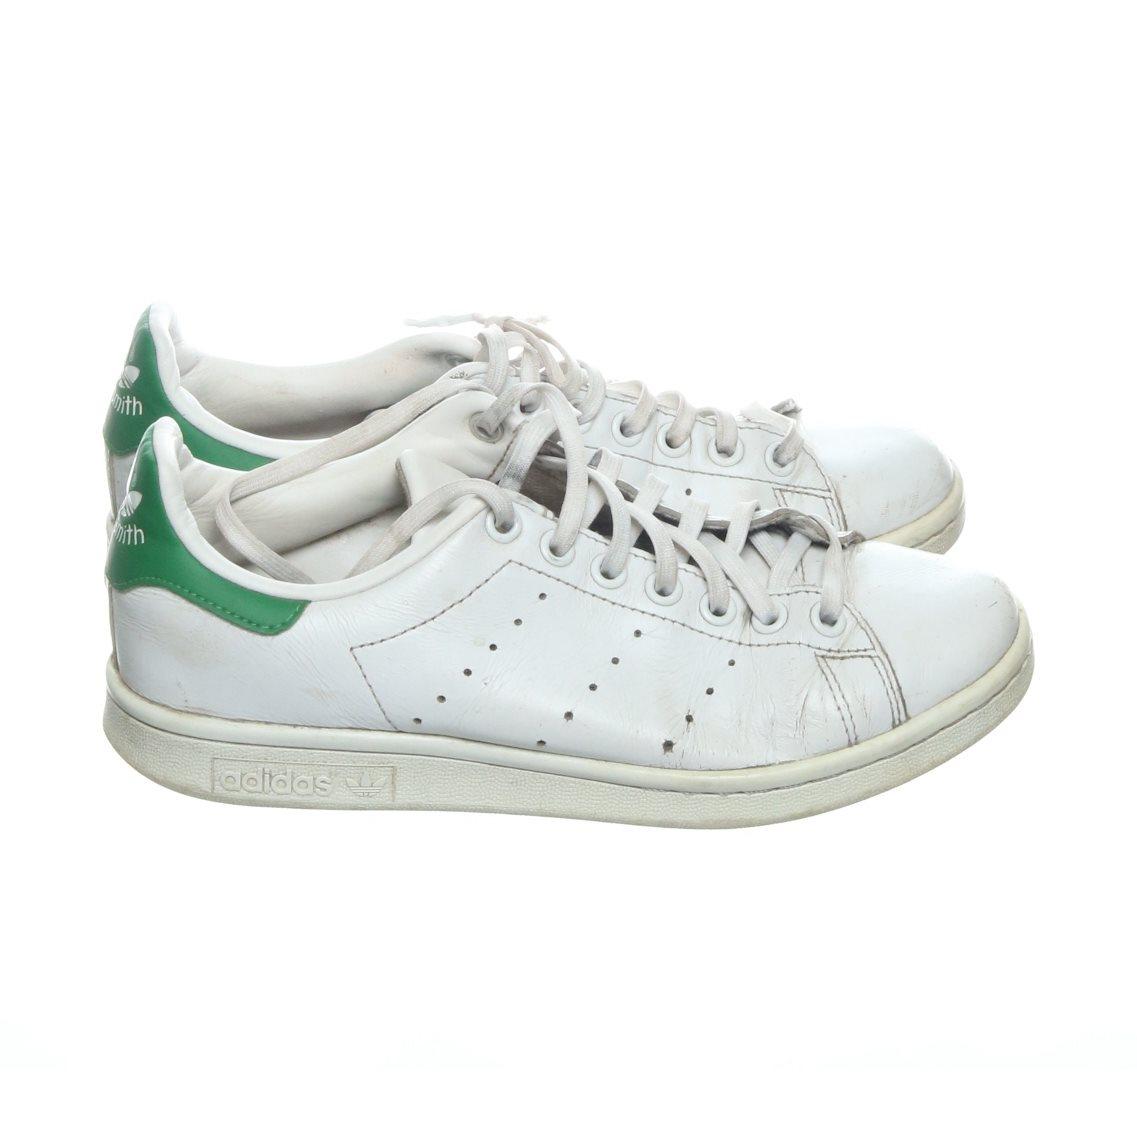 Adidas Stan Smith, Sneakers, Strl: 38, VitGr?n